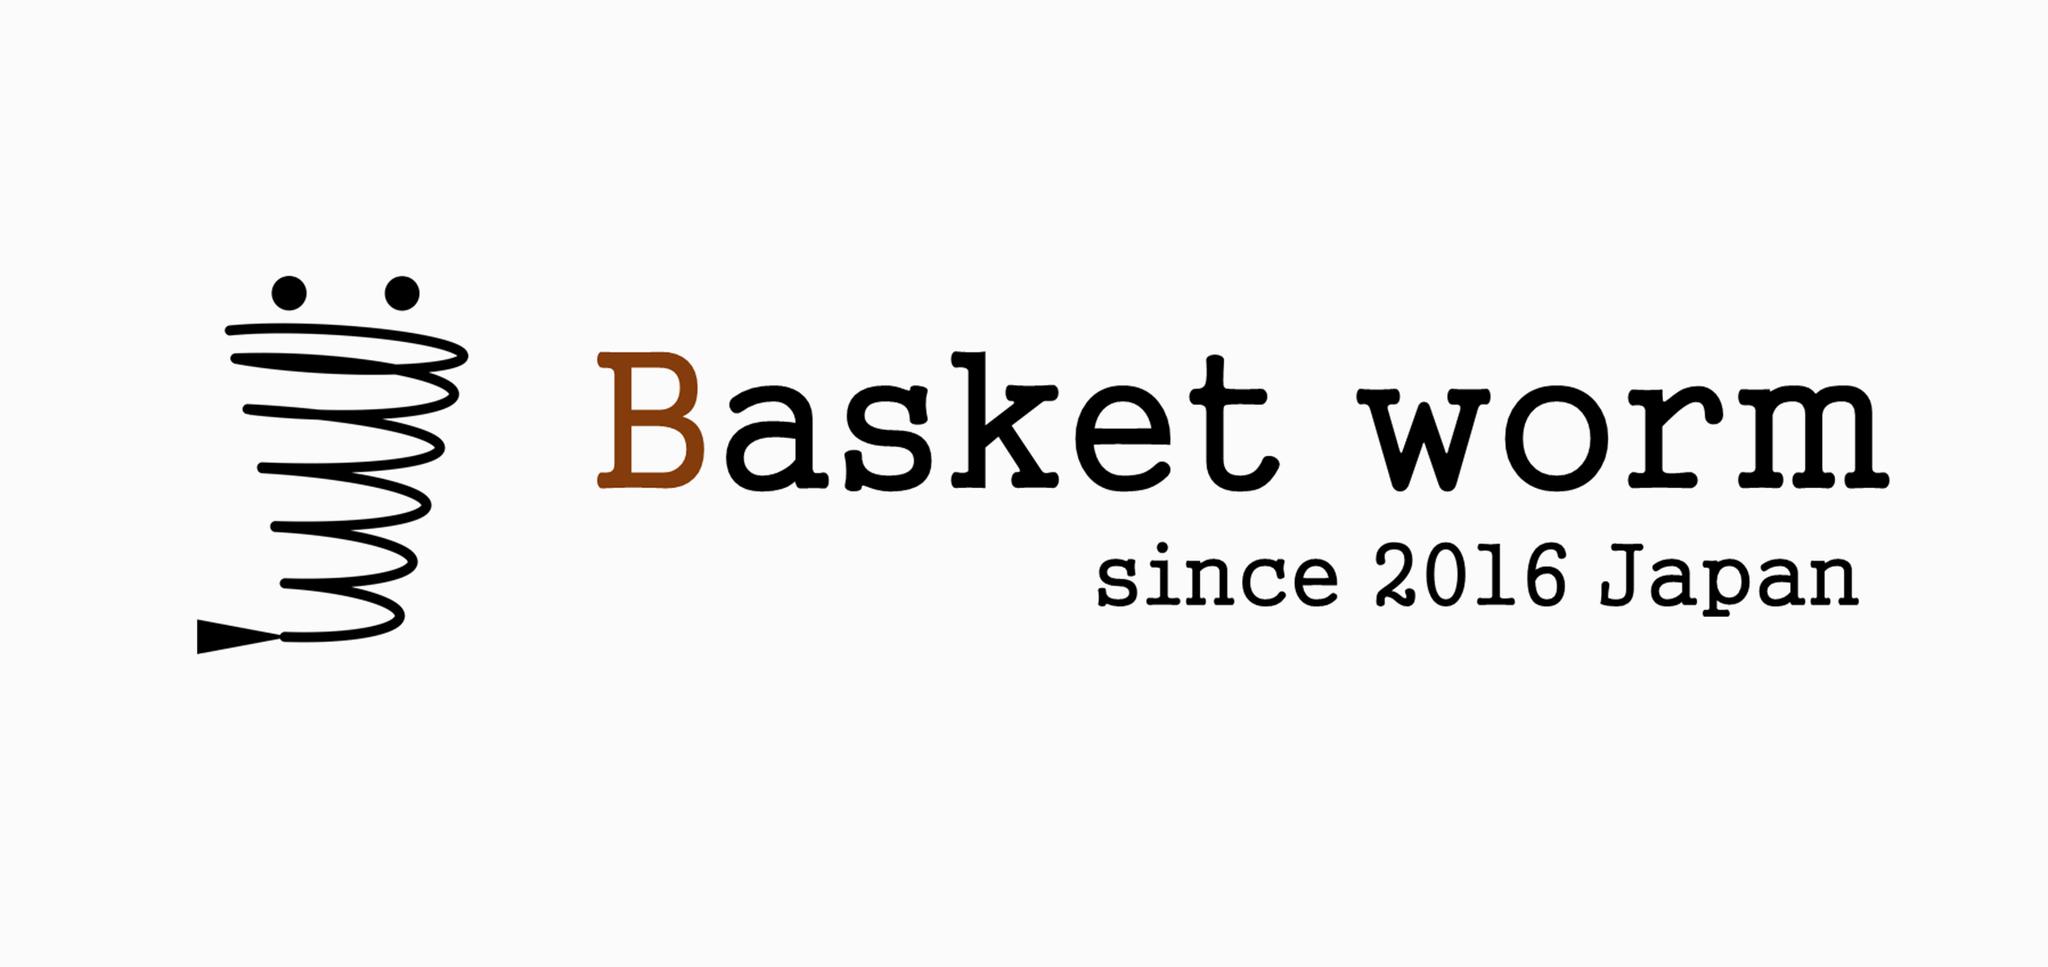 Basket worm バスケットワーム 自閉症を持つ子供のための衣服 商品企画・通販